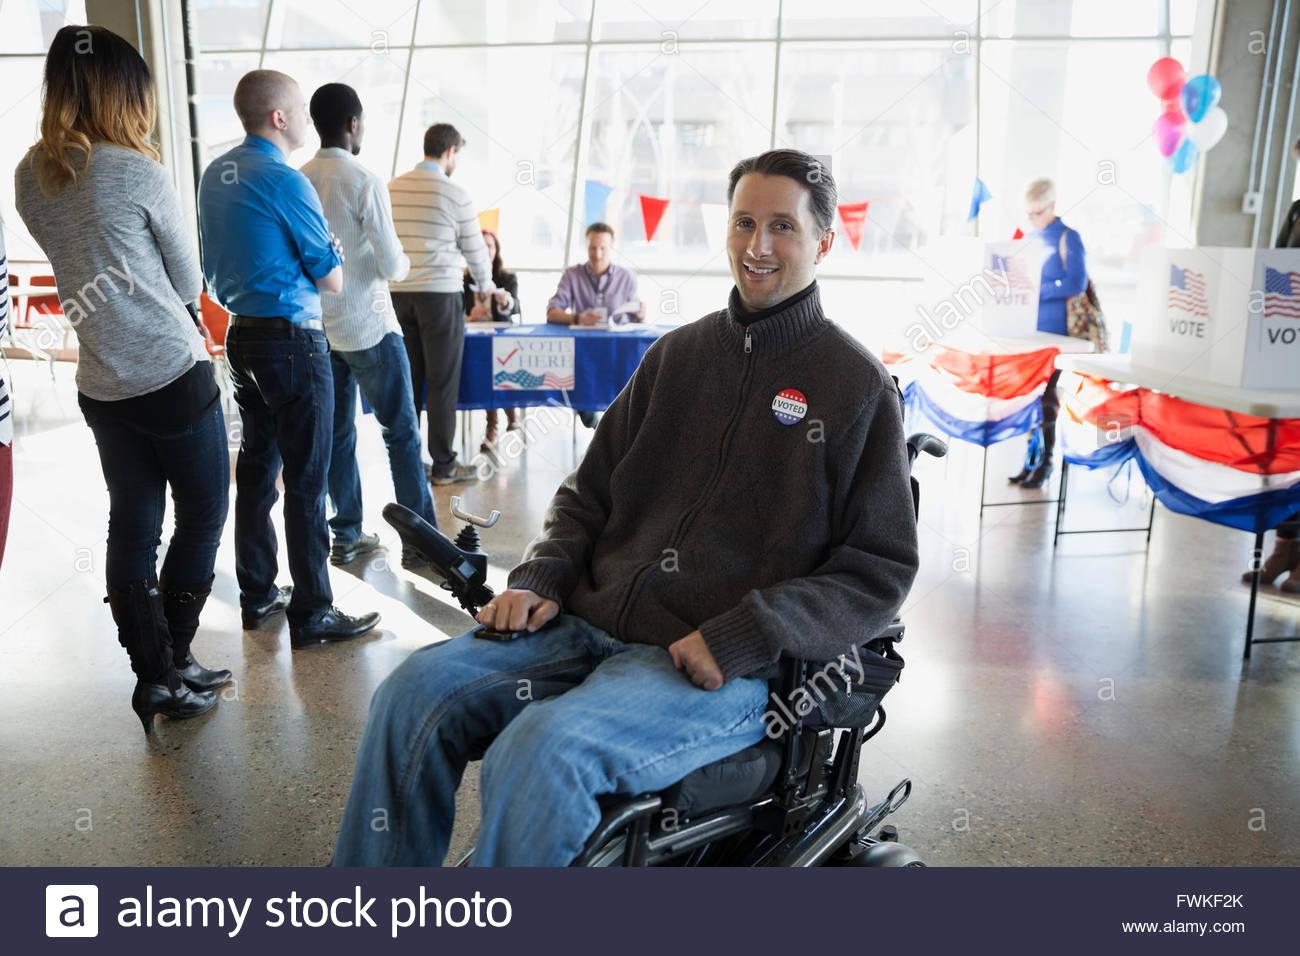 Porträt, Lächeln Mann Rollstuhl am Wähler Wahllokal Stockbild